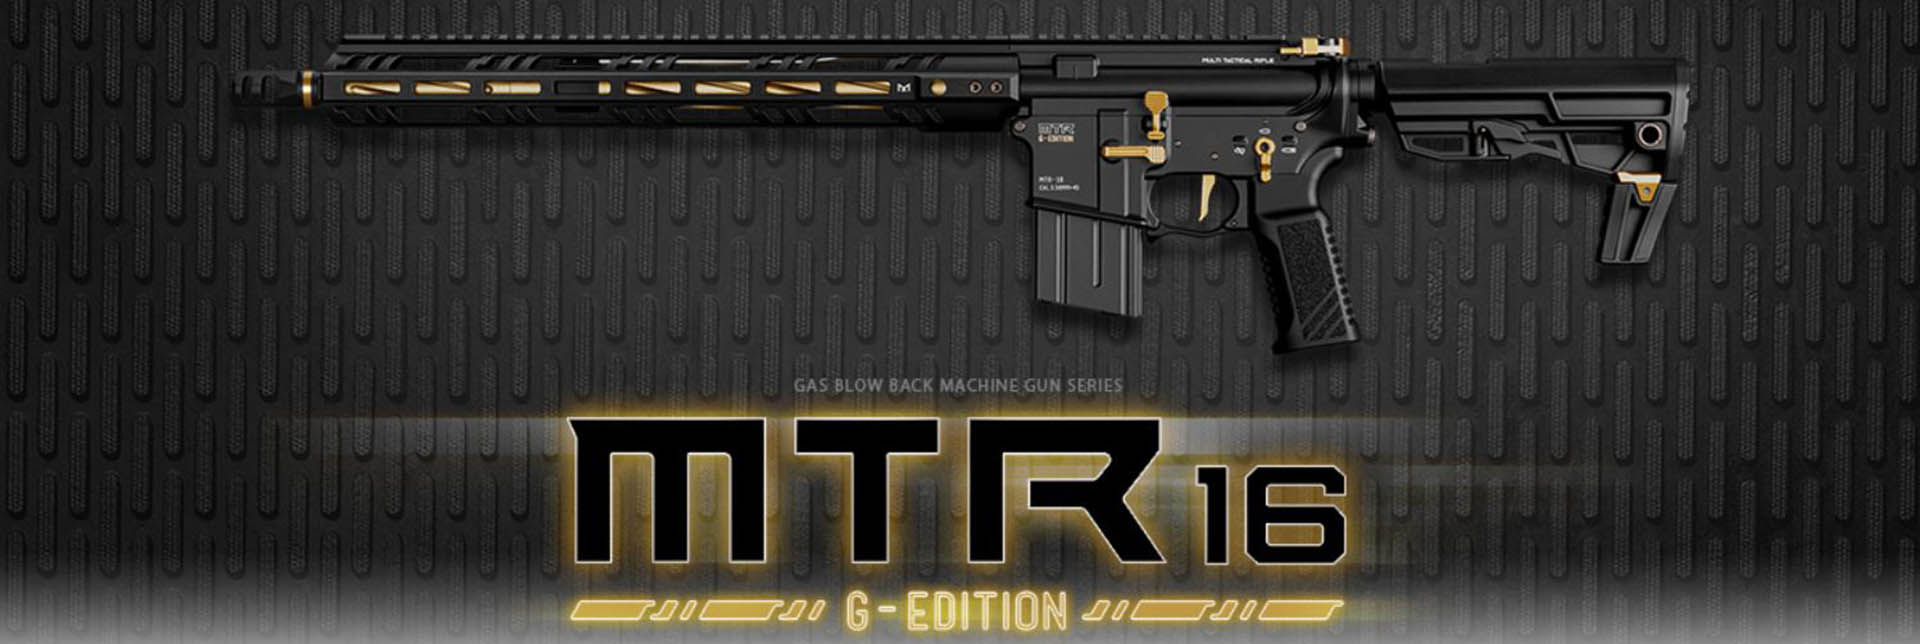 Tokyo Marui GBB MTR16 - Gold Edition